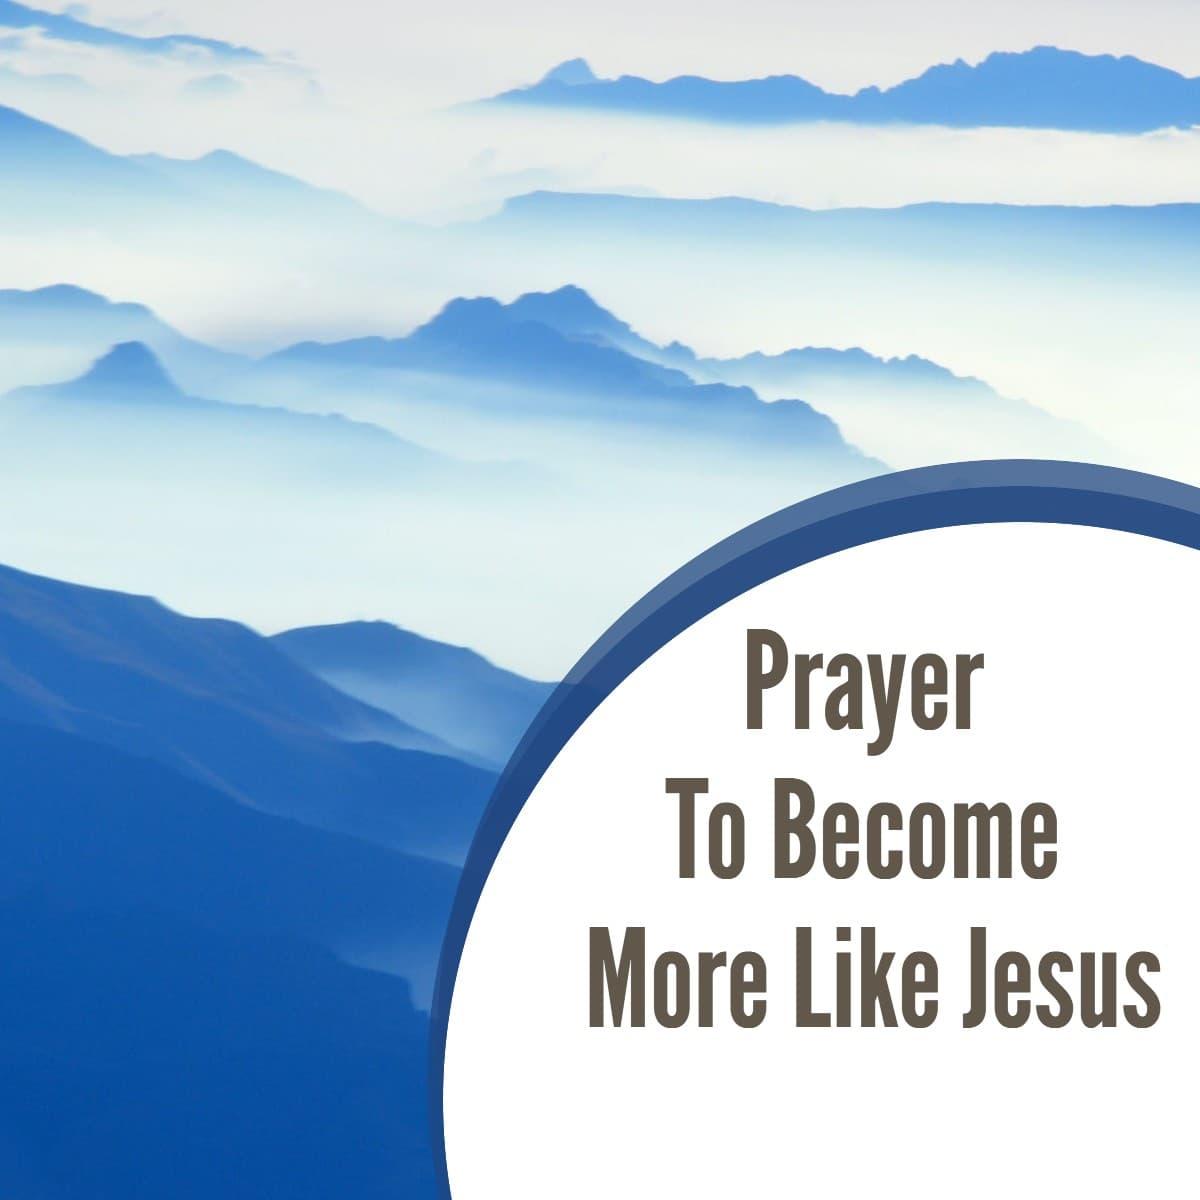 Prayer to become more like Jesus